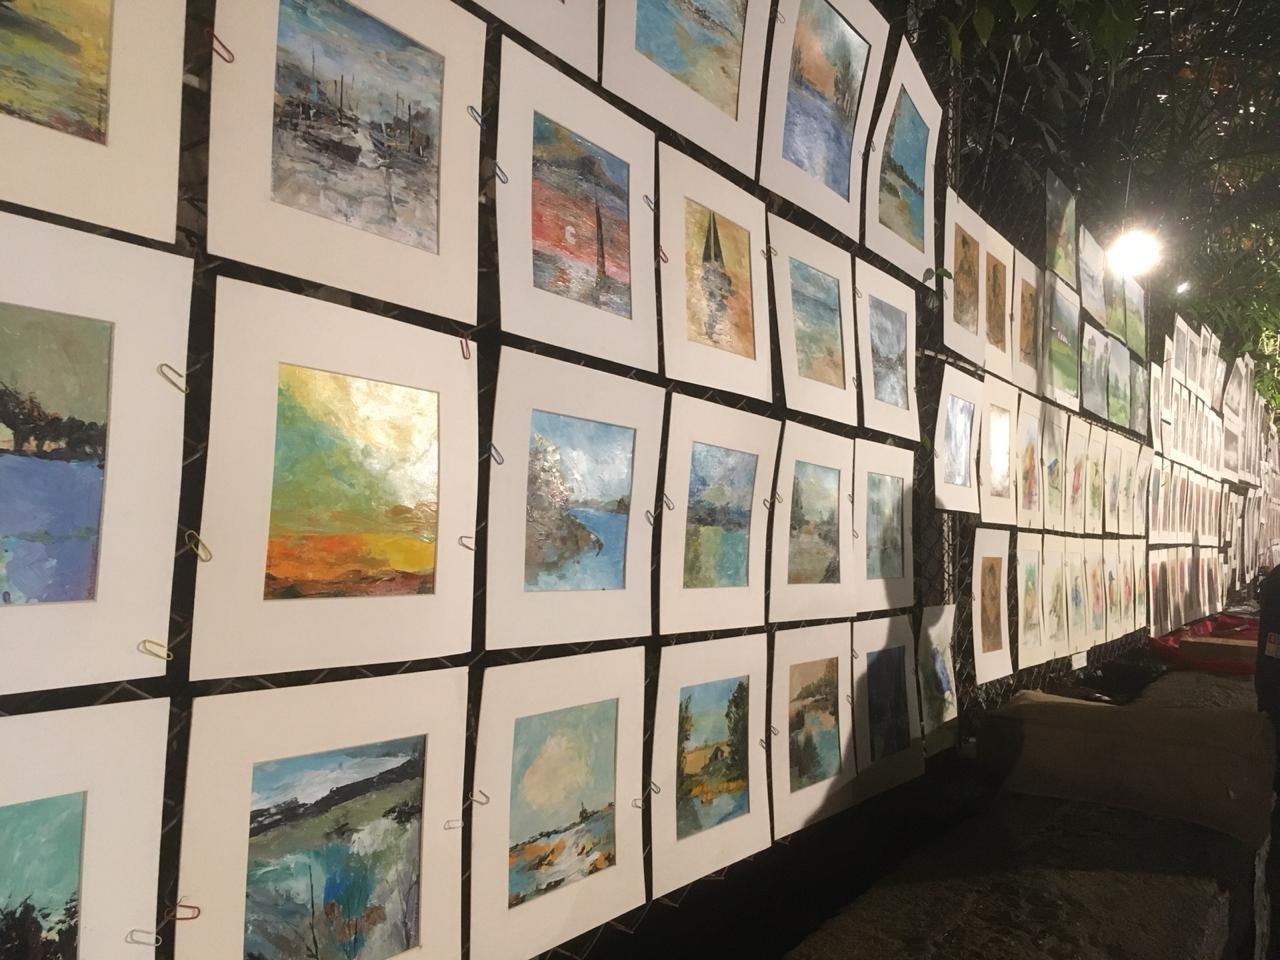 Kala Ghoda Arts Festival 2019: Heaven on Earth for an art lover